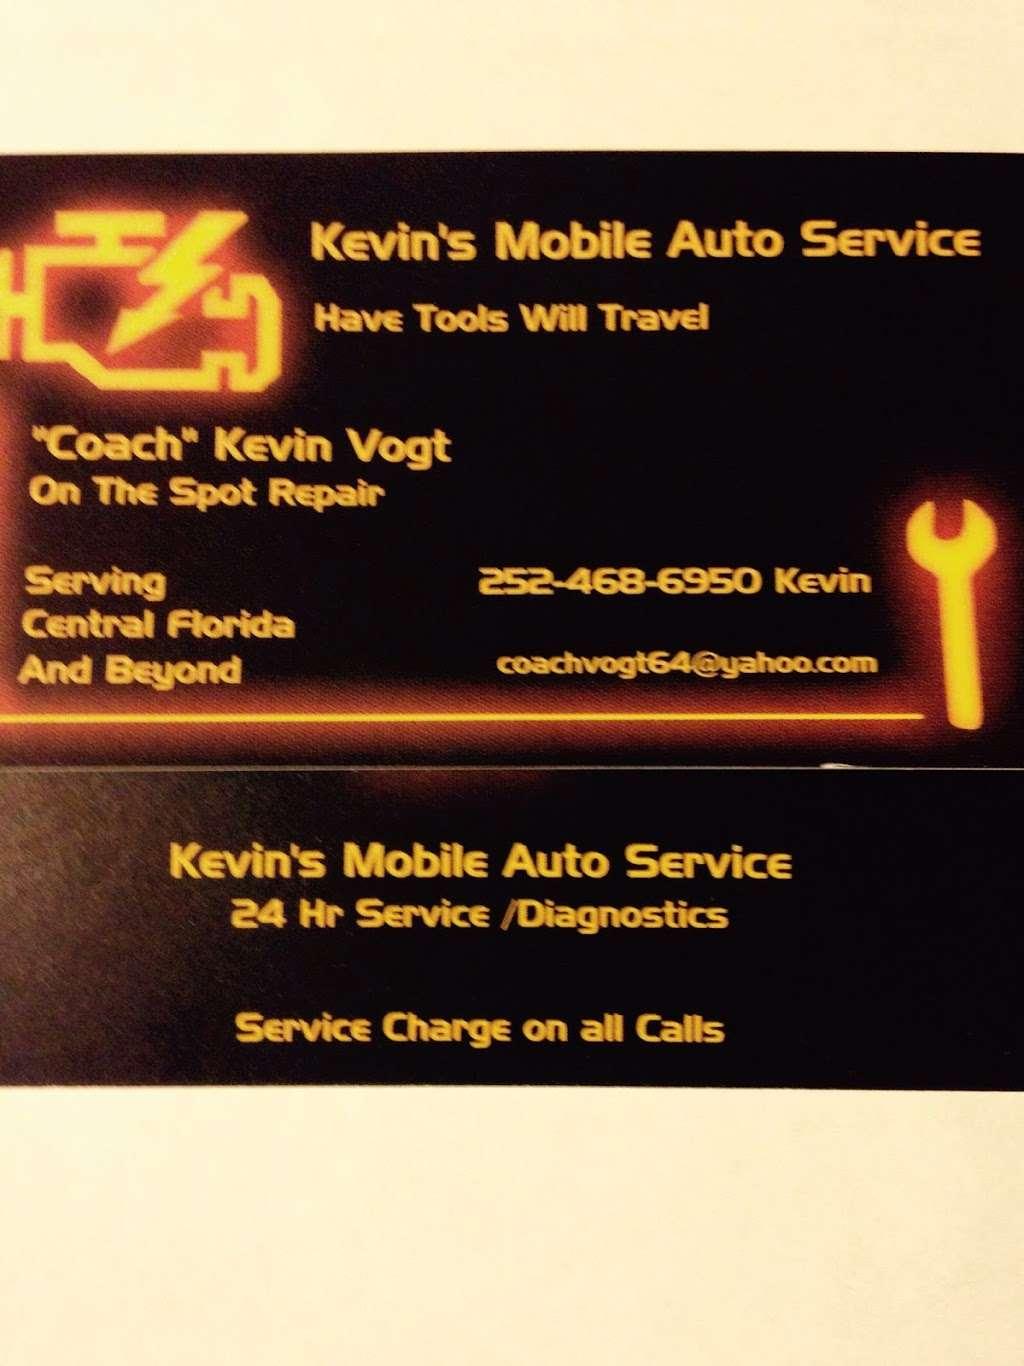 Kevins Mobile Auto Service - car repair    Photo 10 of 10   Address: 1112 Cobblestone Cir, Kissimmee, FL 34744, USA   Phone: (252) 468-6950